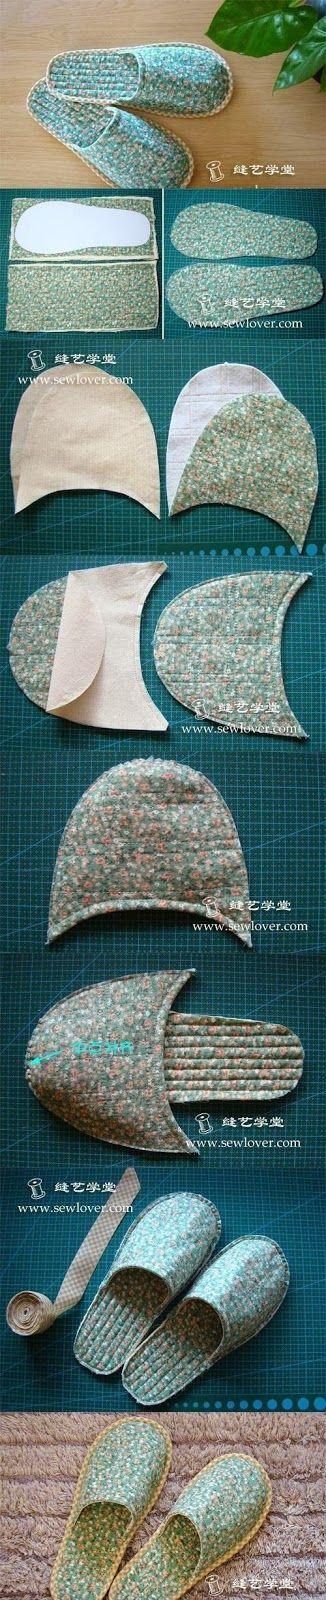 DIY : Sew Slipper | DIY & Crafts Tutorials